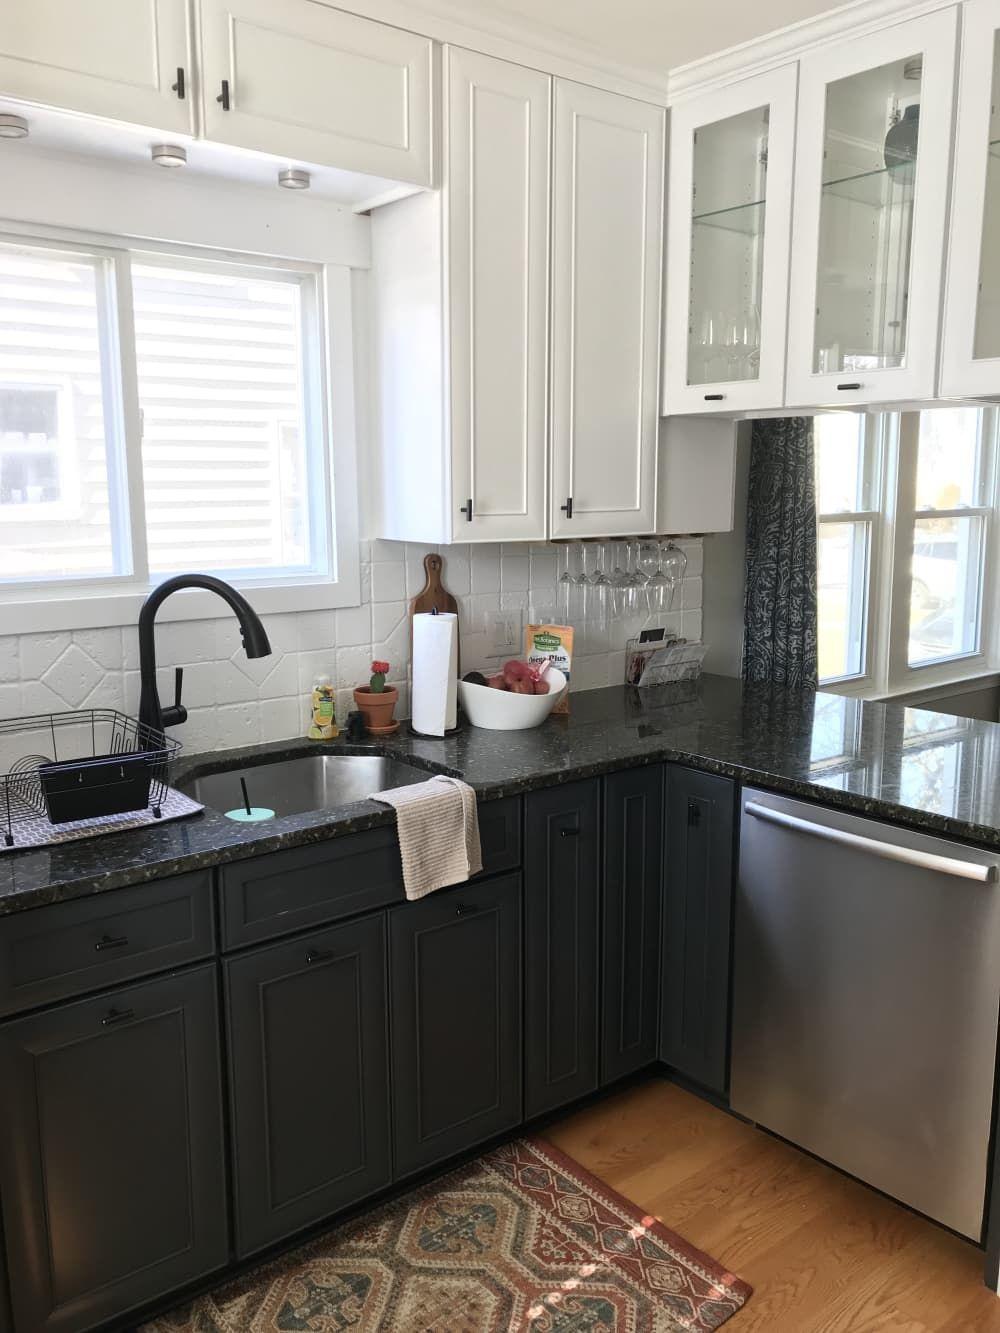 Under 1000 Kitchen Makeovers That Look Like A Million Bucks Diy Kitchen Remodel Condo Kitchen Remodel Kitchen Remodel Cost